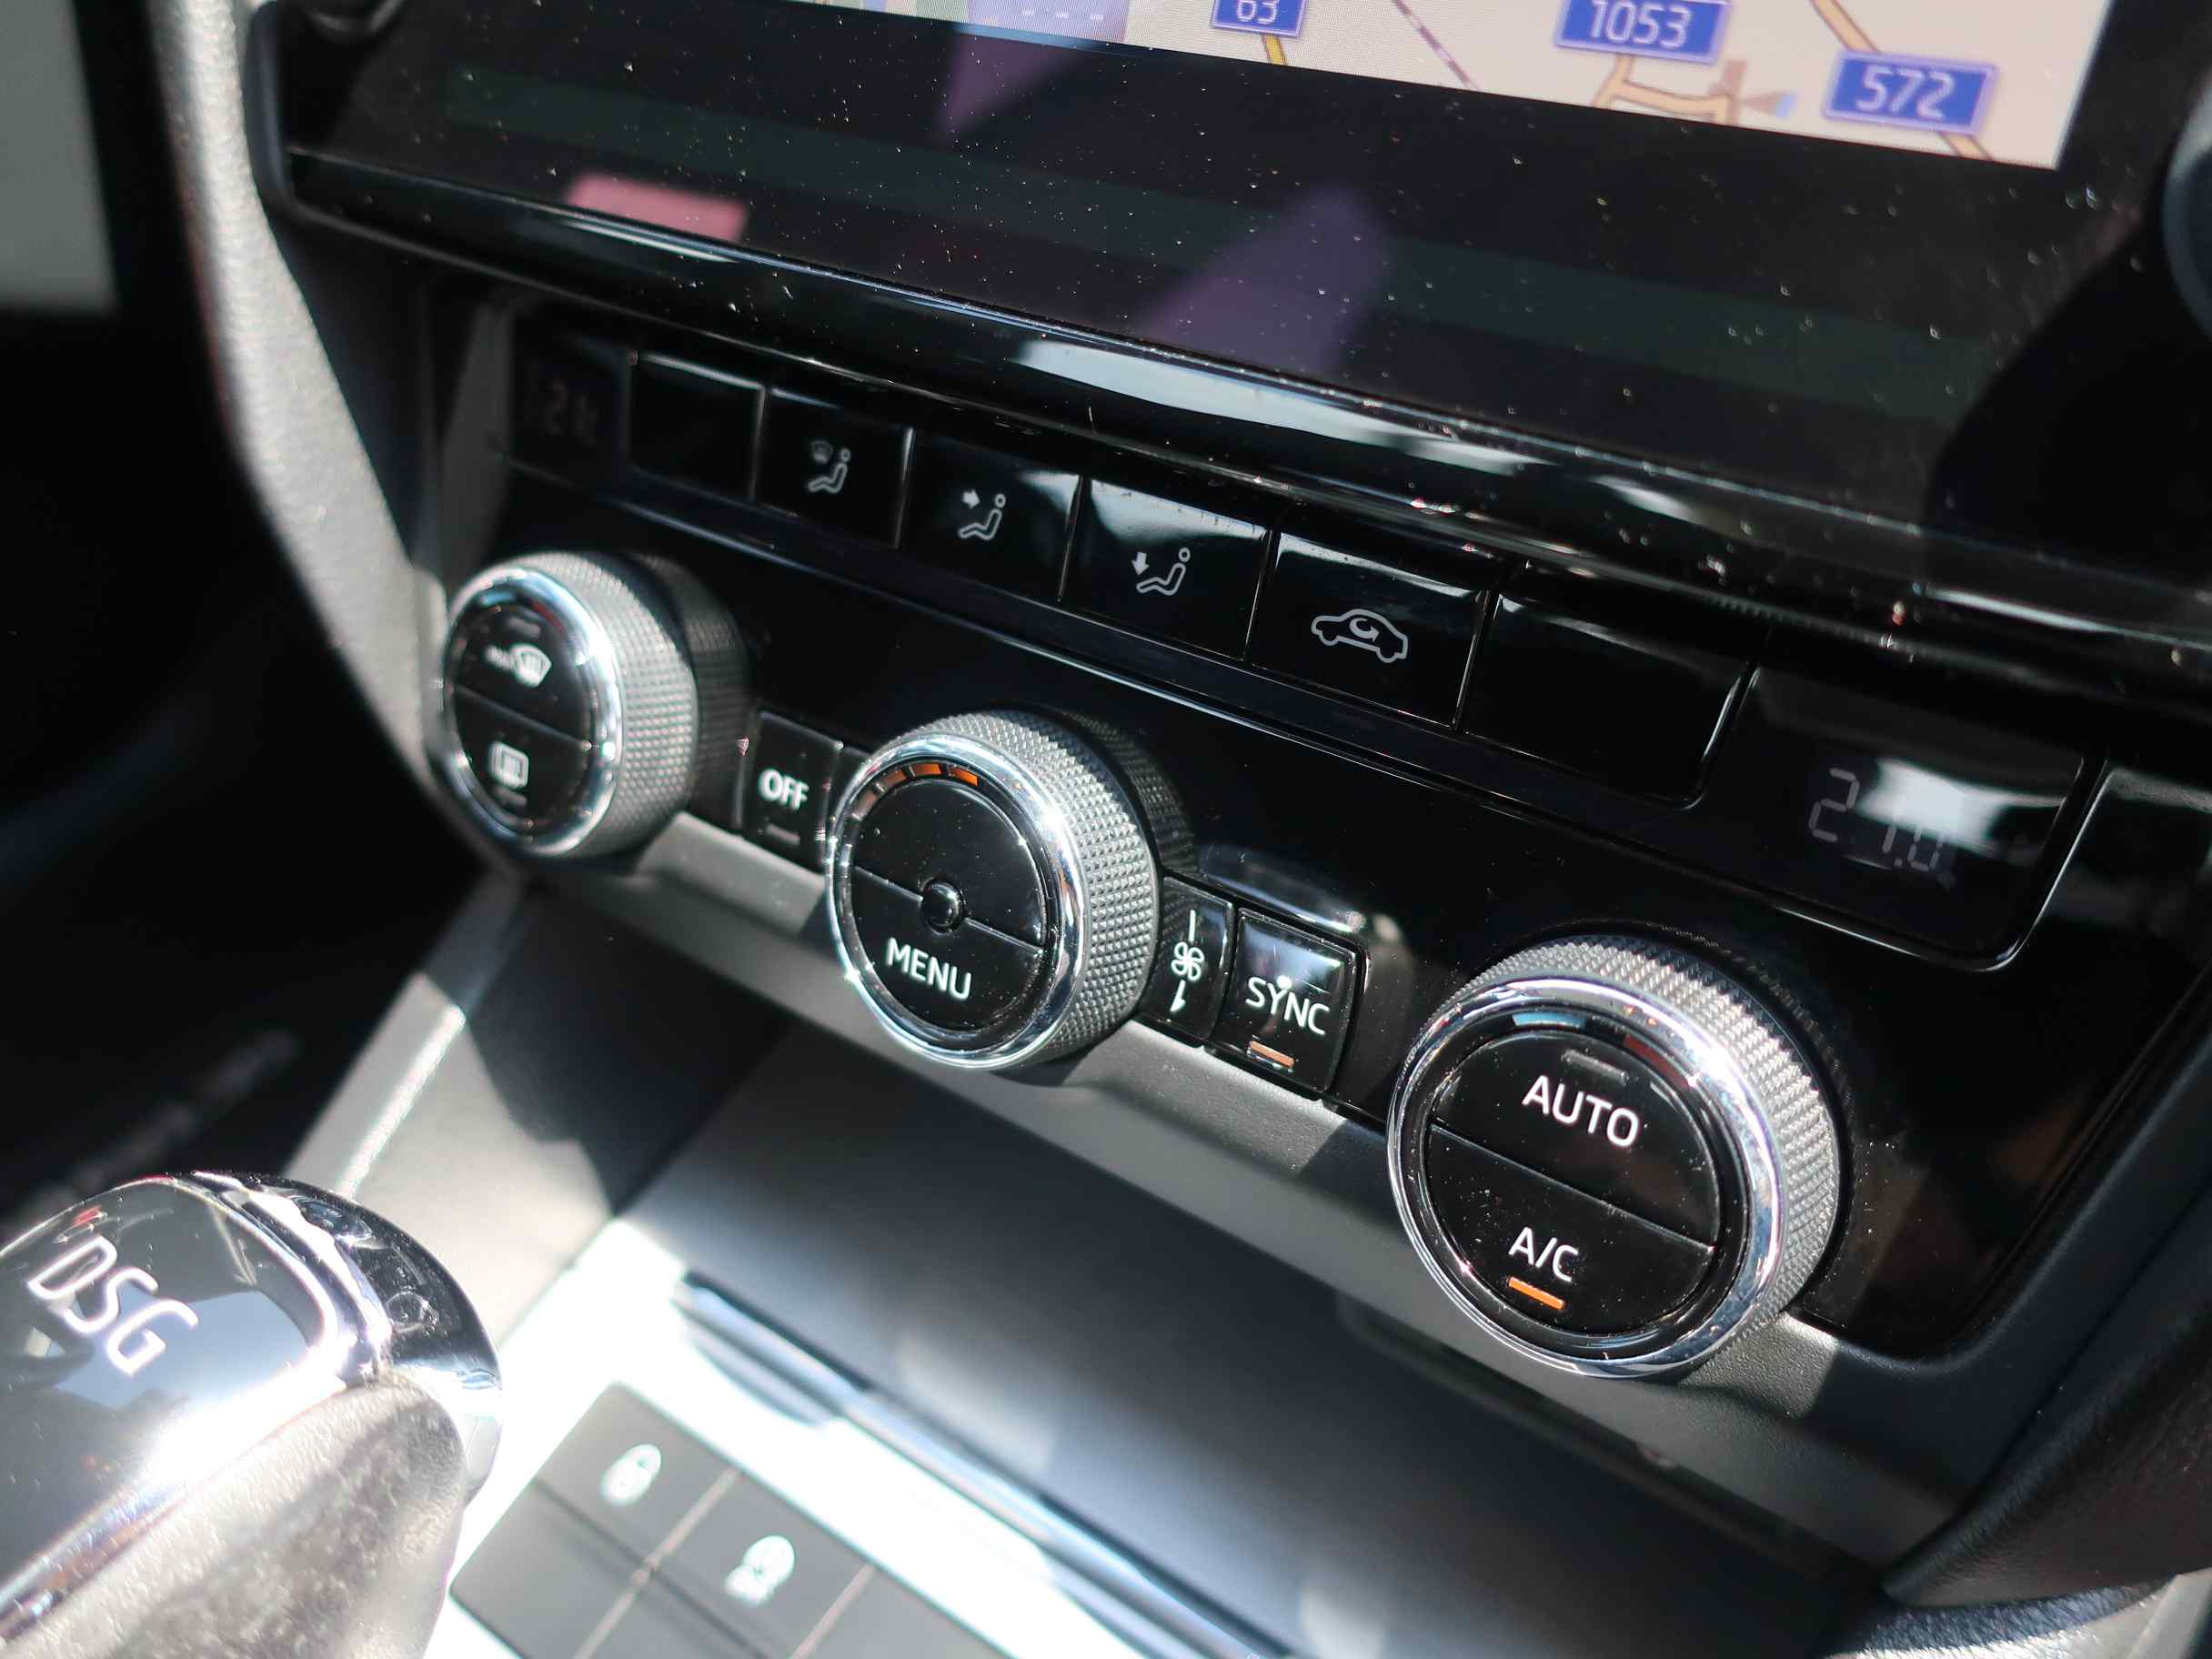 Škoda Octavia III Combi 2.0 TDI Executive DSG